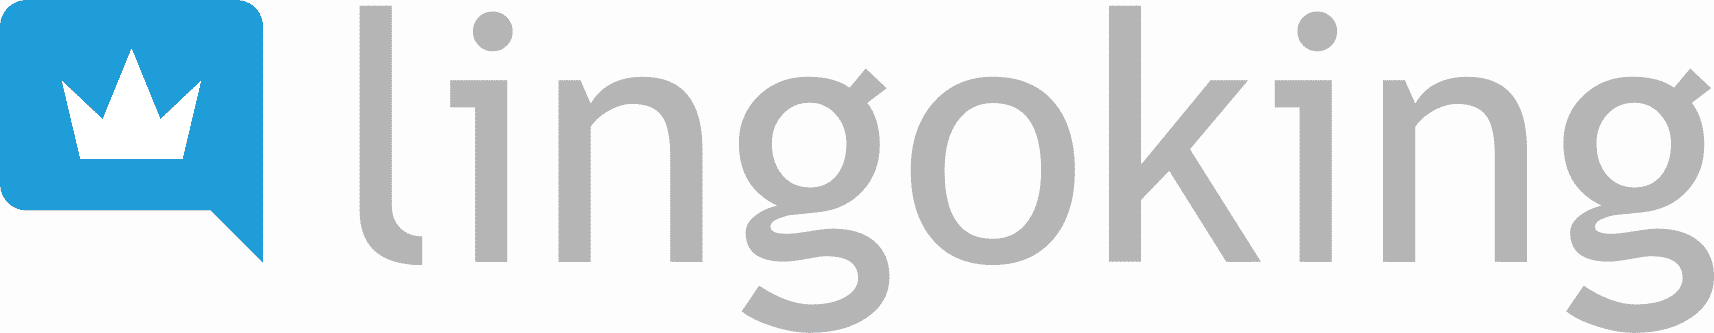 logo lingoking - Certified Translations